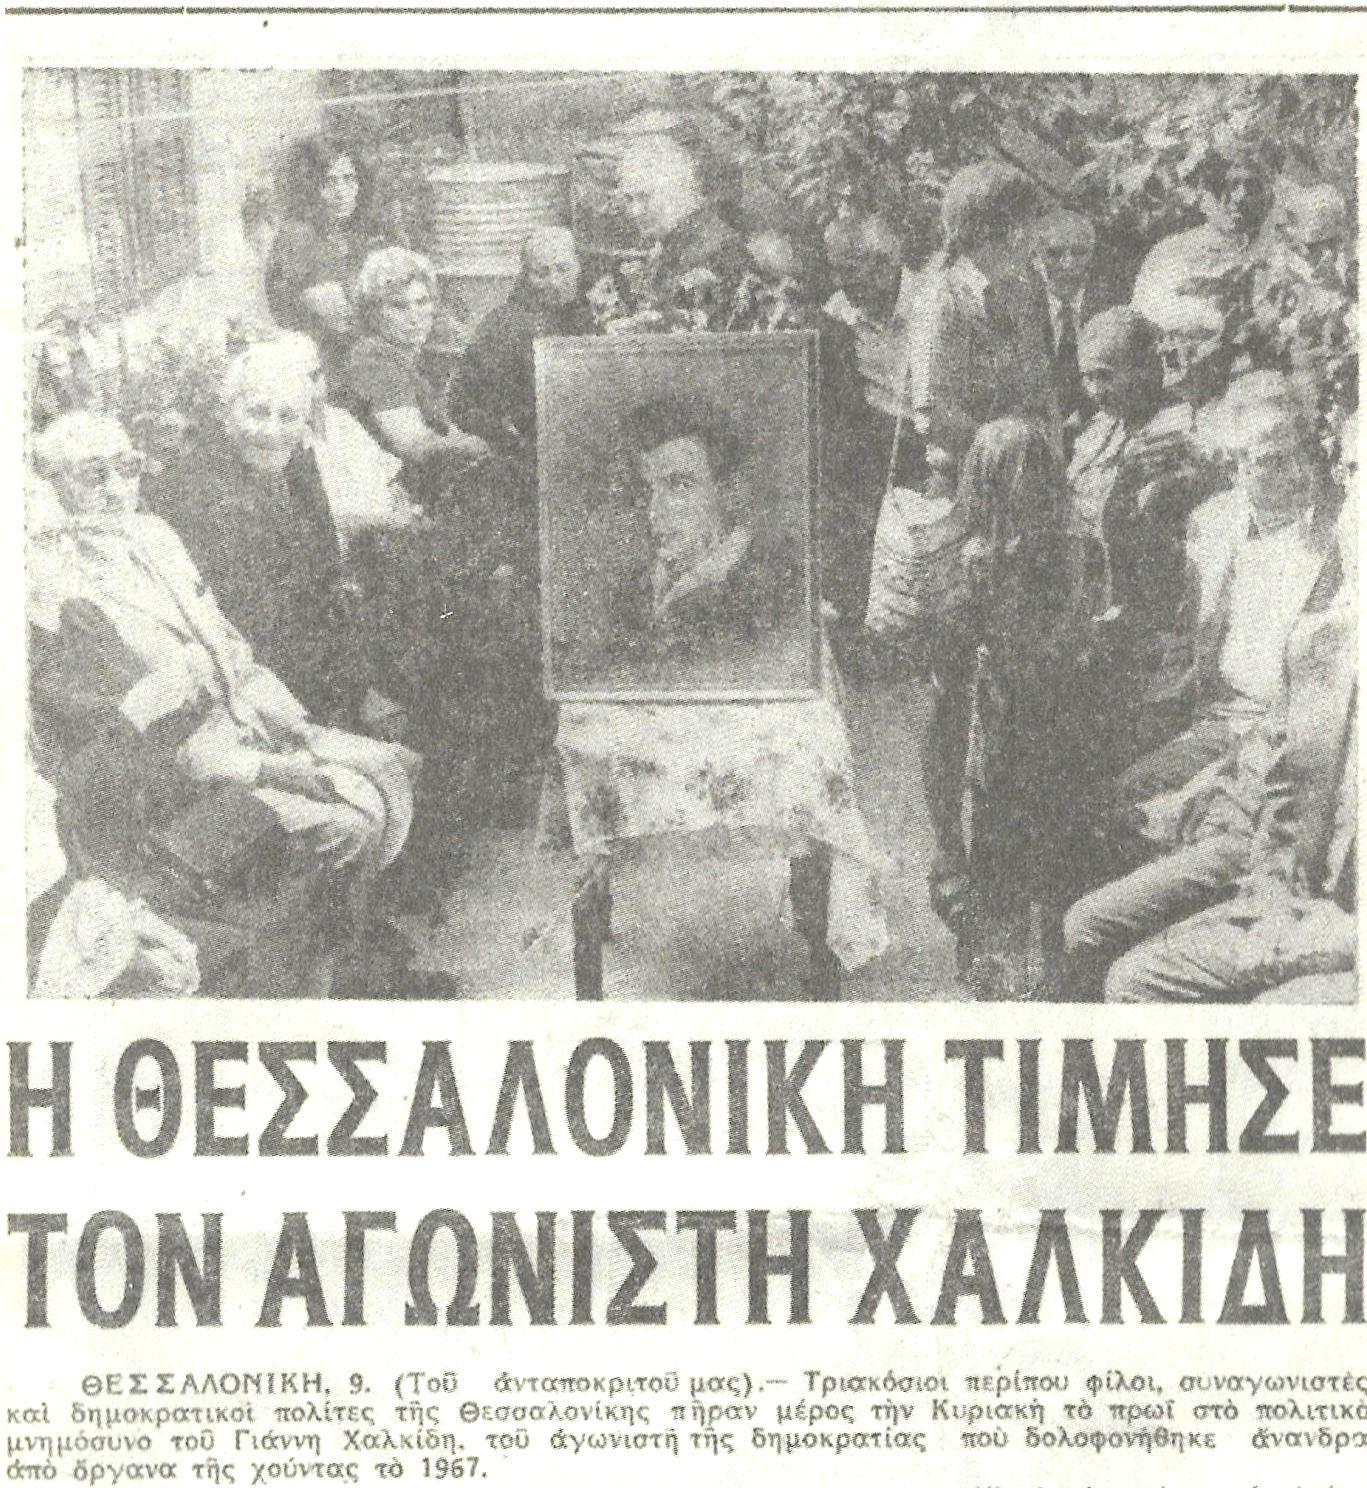 Xalkidhs-1974 001